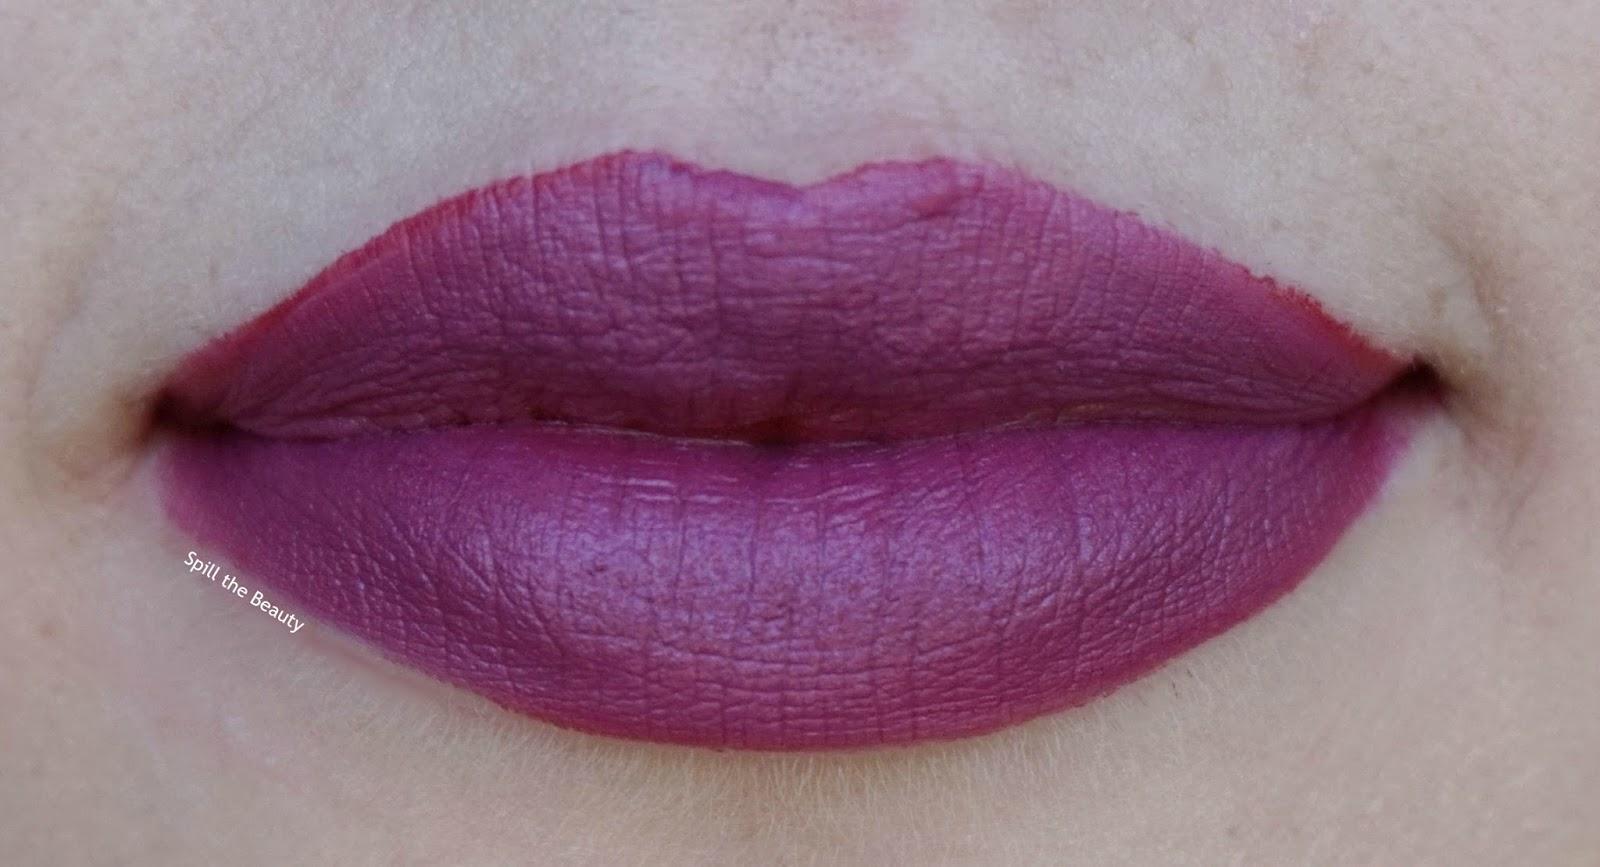 dior rouge ambitious matte + montaigne matte - lips